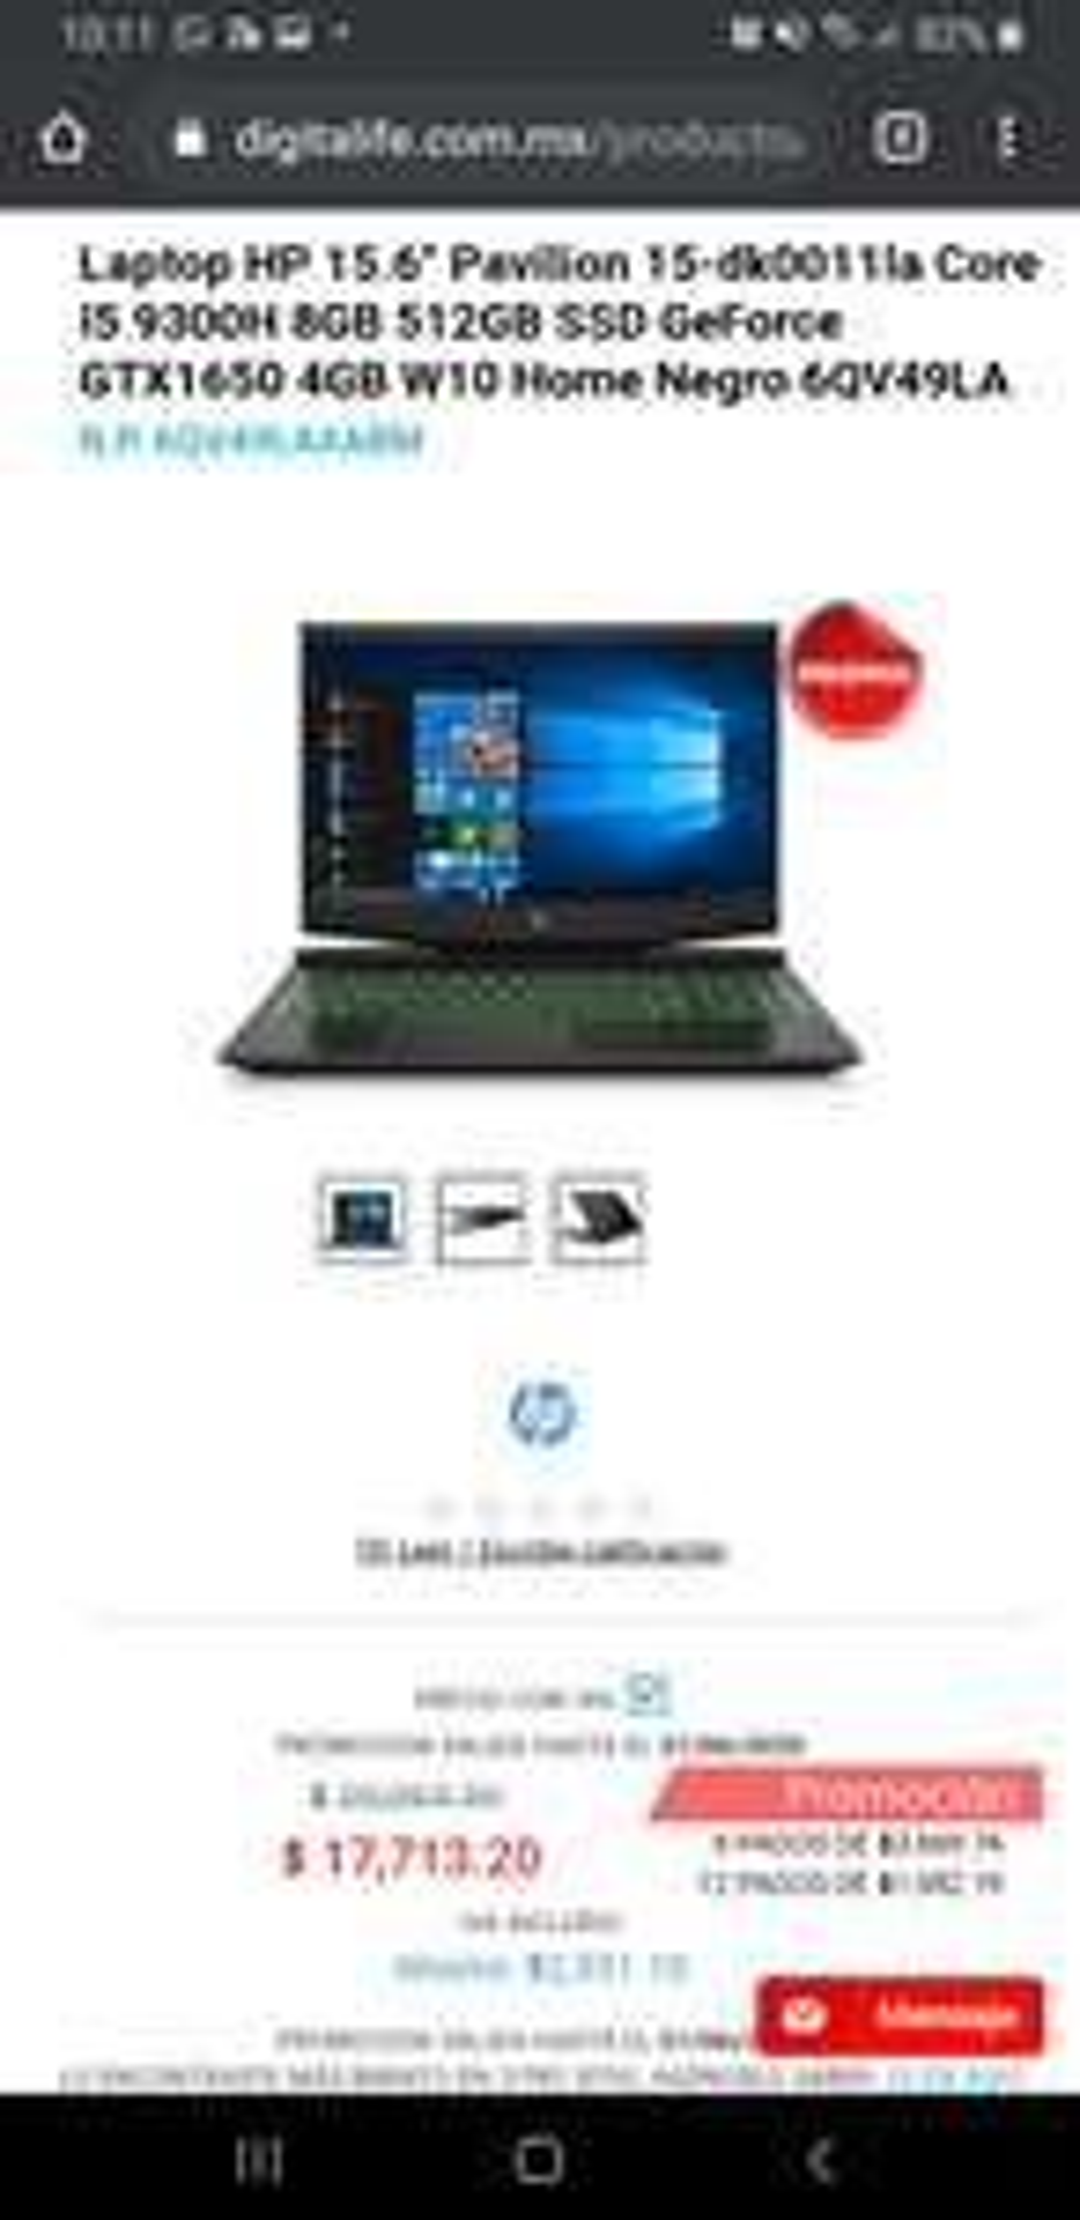 "digitalife Laptop HP 15.6"" Pavilion 15-dk0011la Core I5 9300H 8GB 512GB SSD GeForce GTX1650 4G con Tarjeta Banorte"